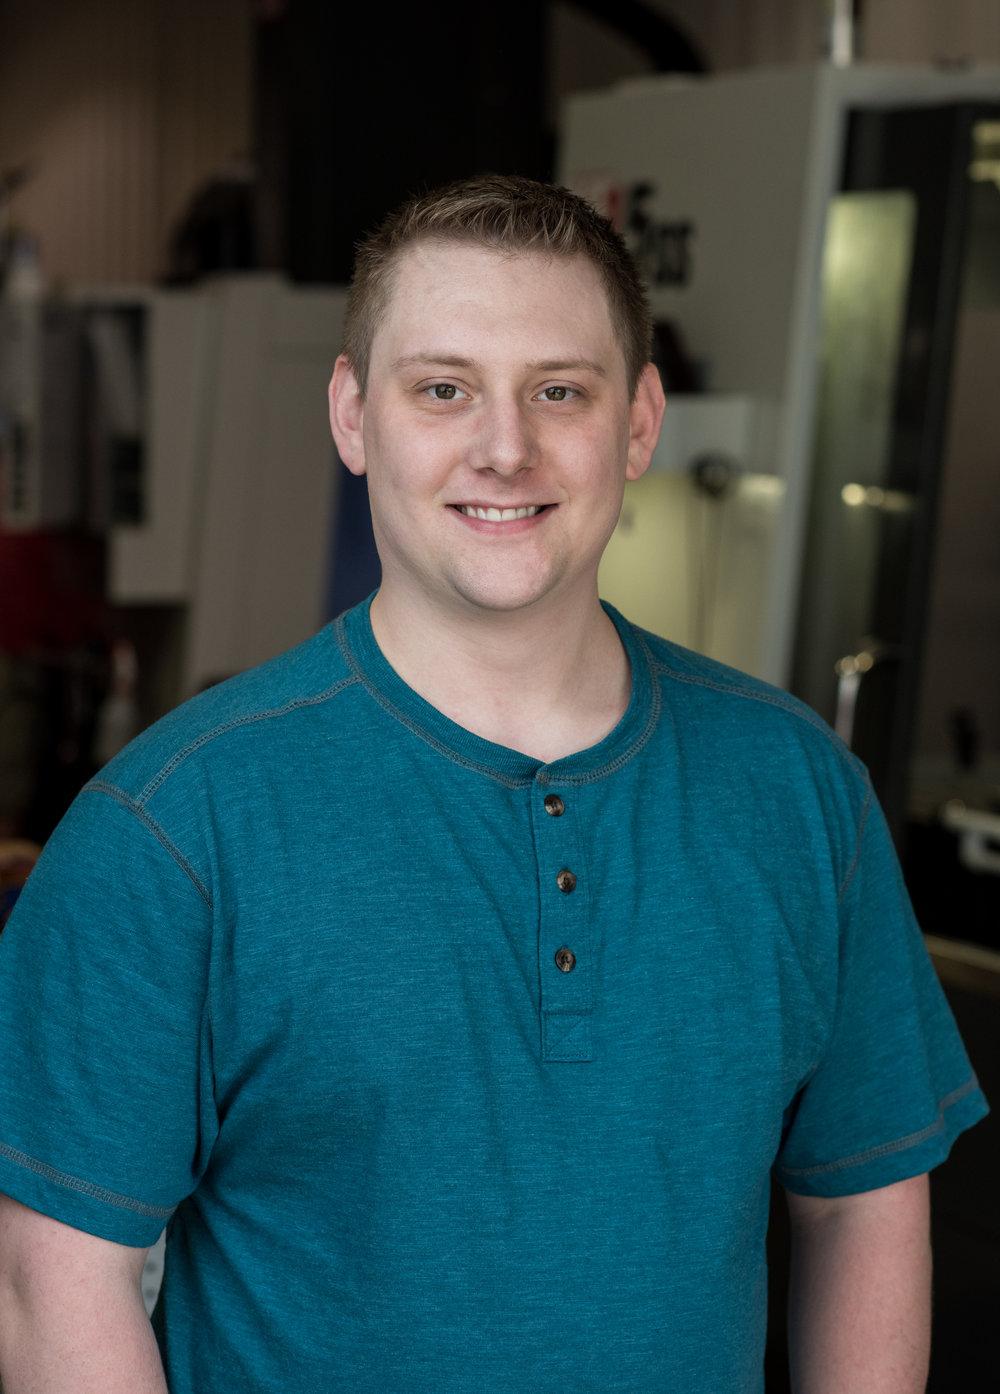 Joshua Schorp